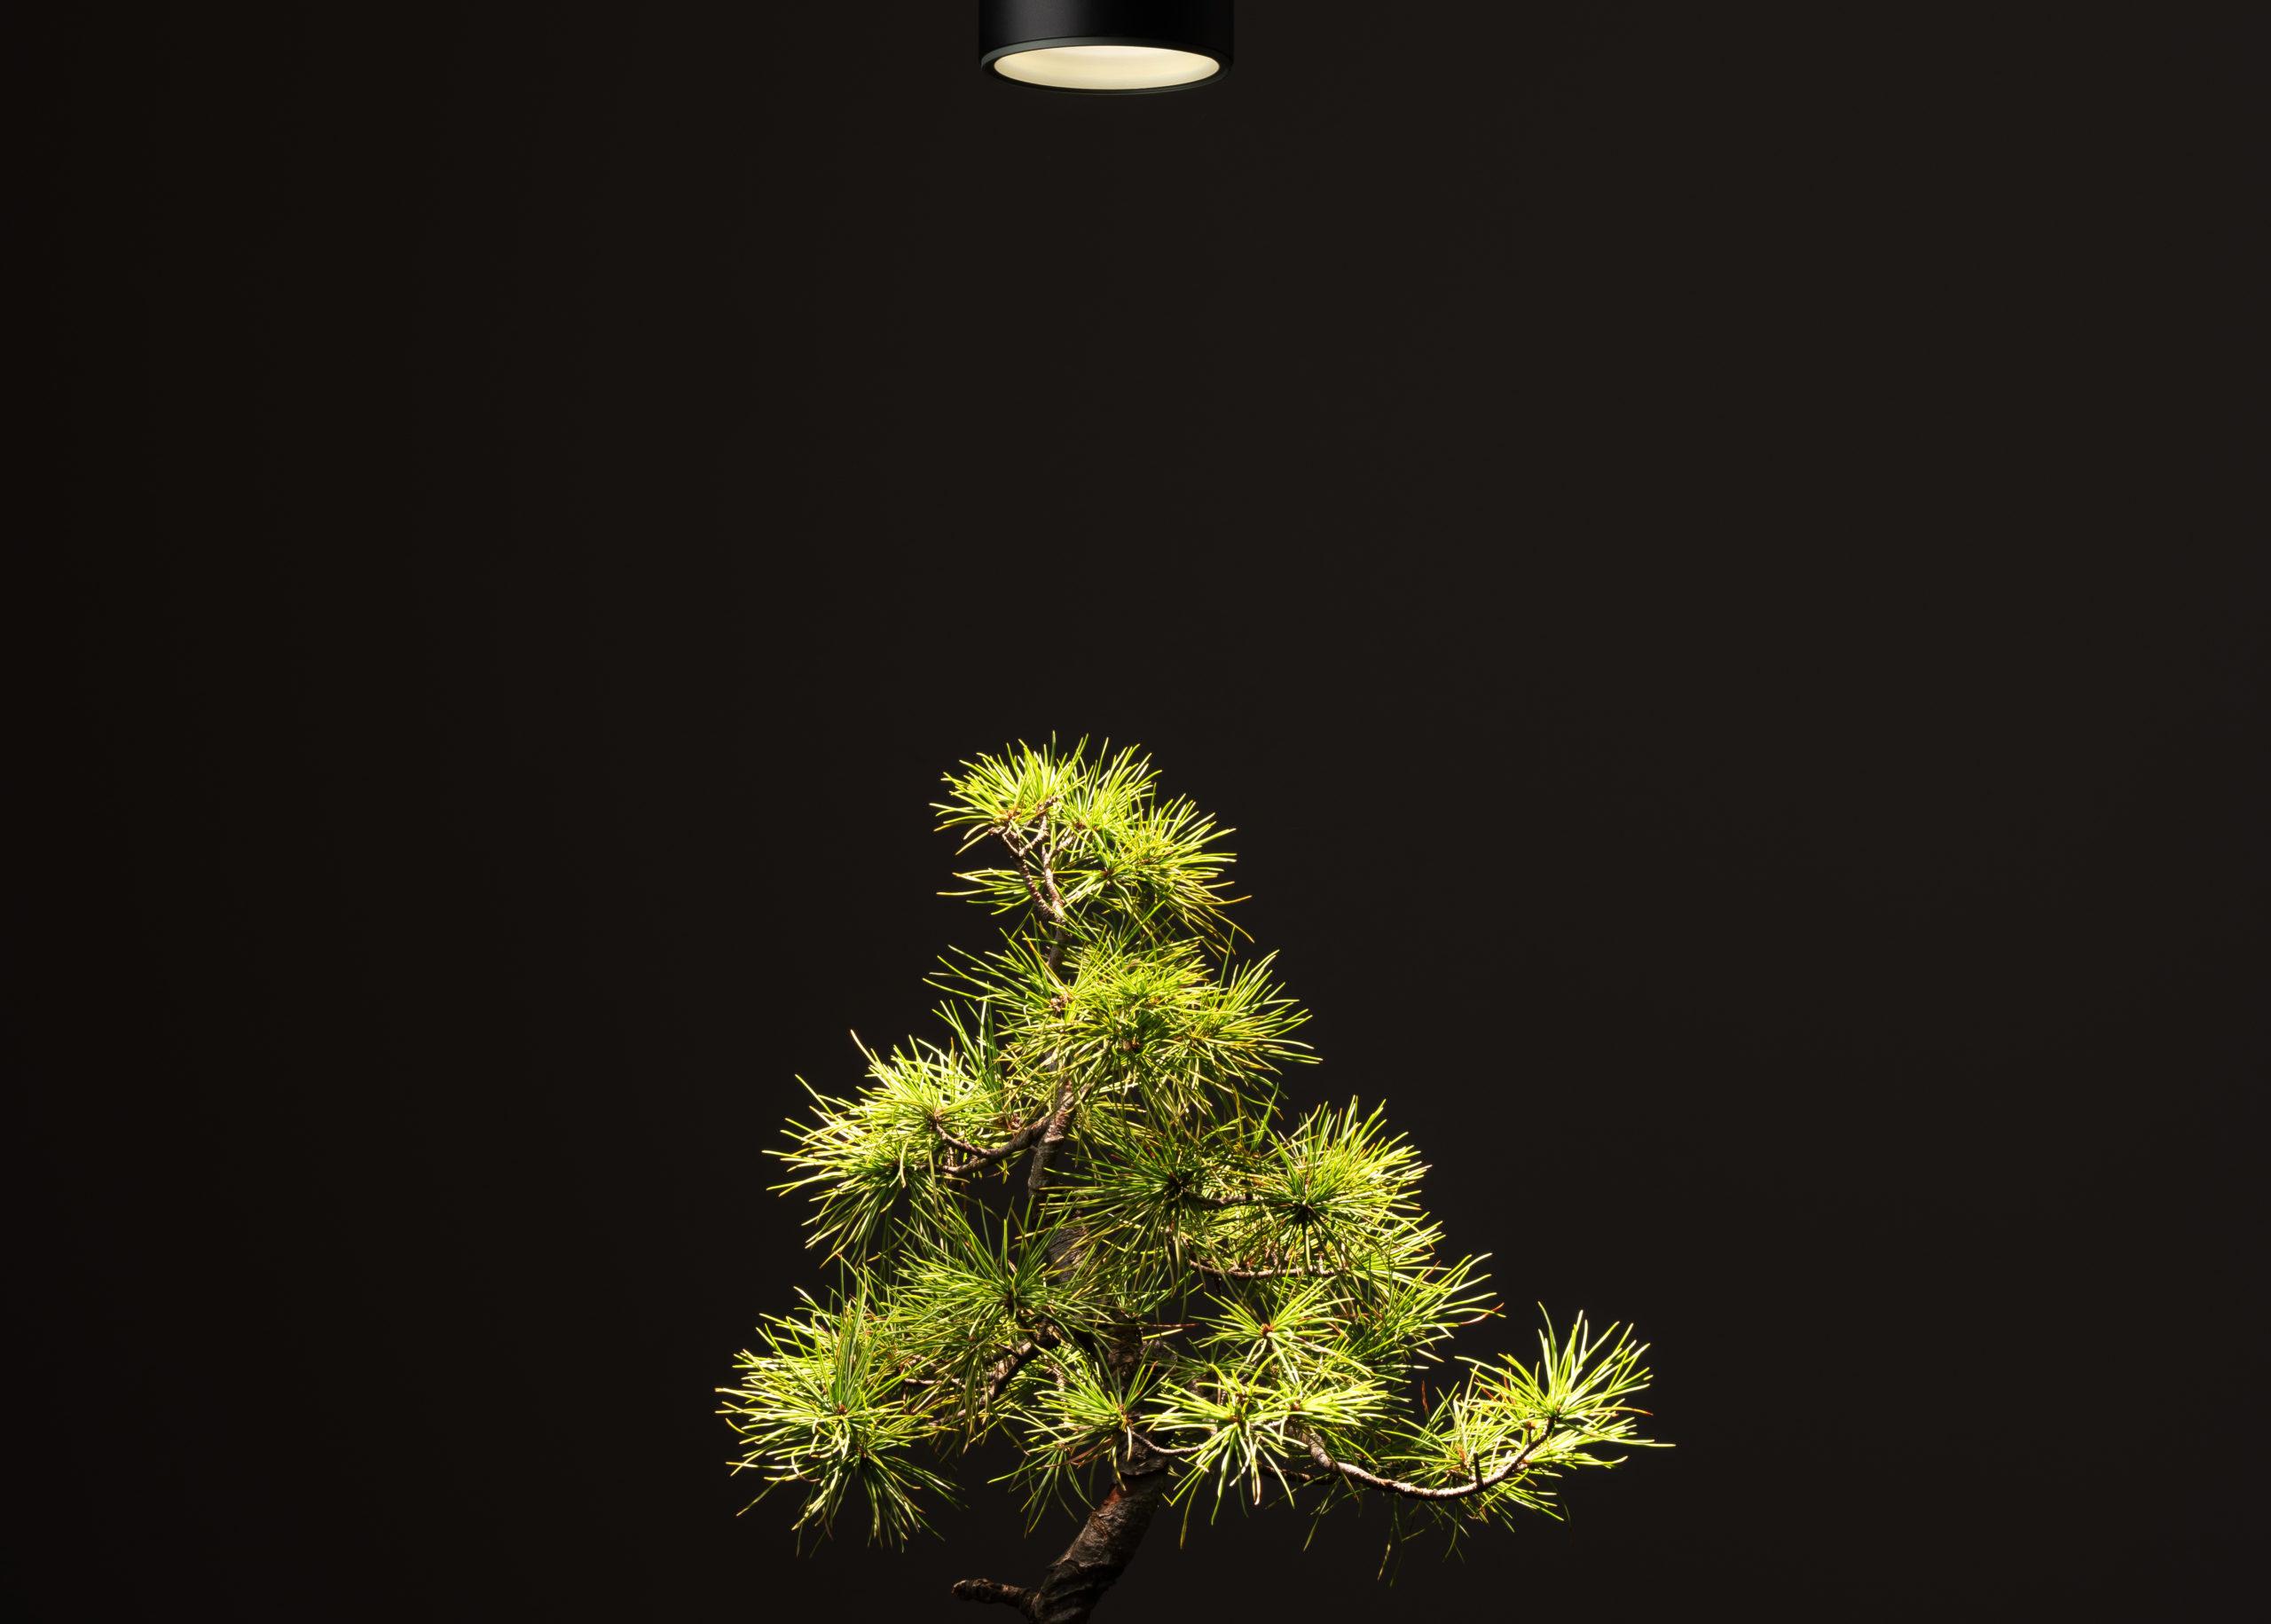 OURA 室內植物燈 - 調光式軌道燈 3D均光比較圖 01有 scaled